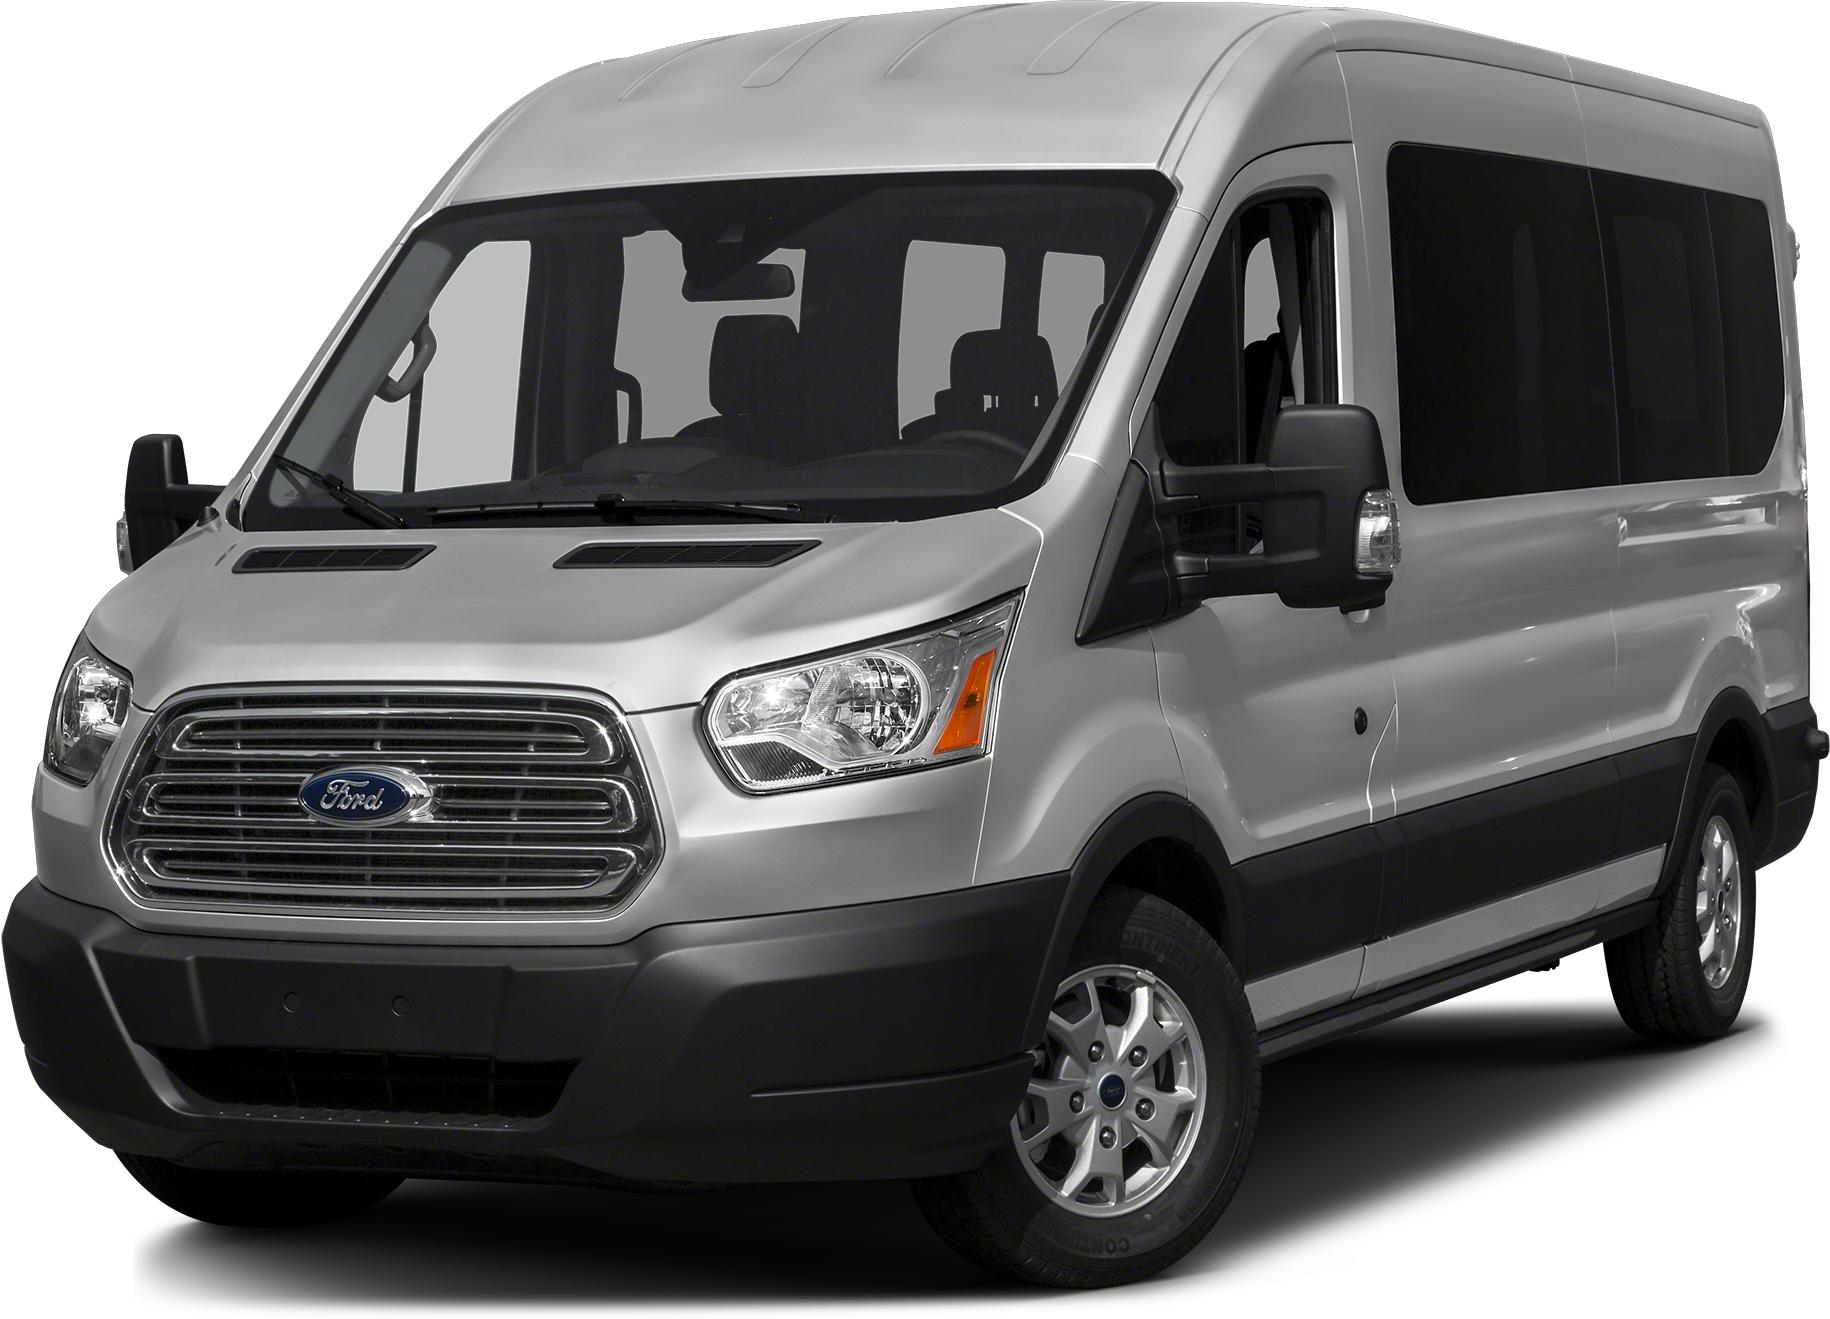 ford transit микроавтобус 16 пассажирских мест